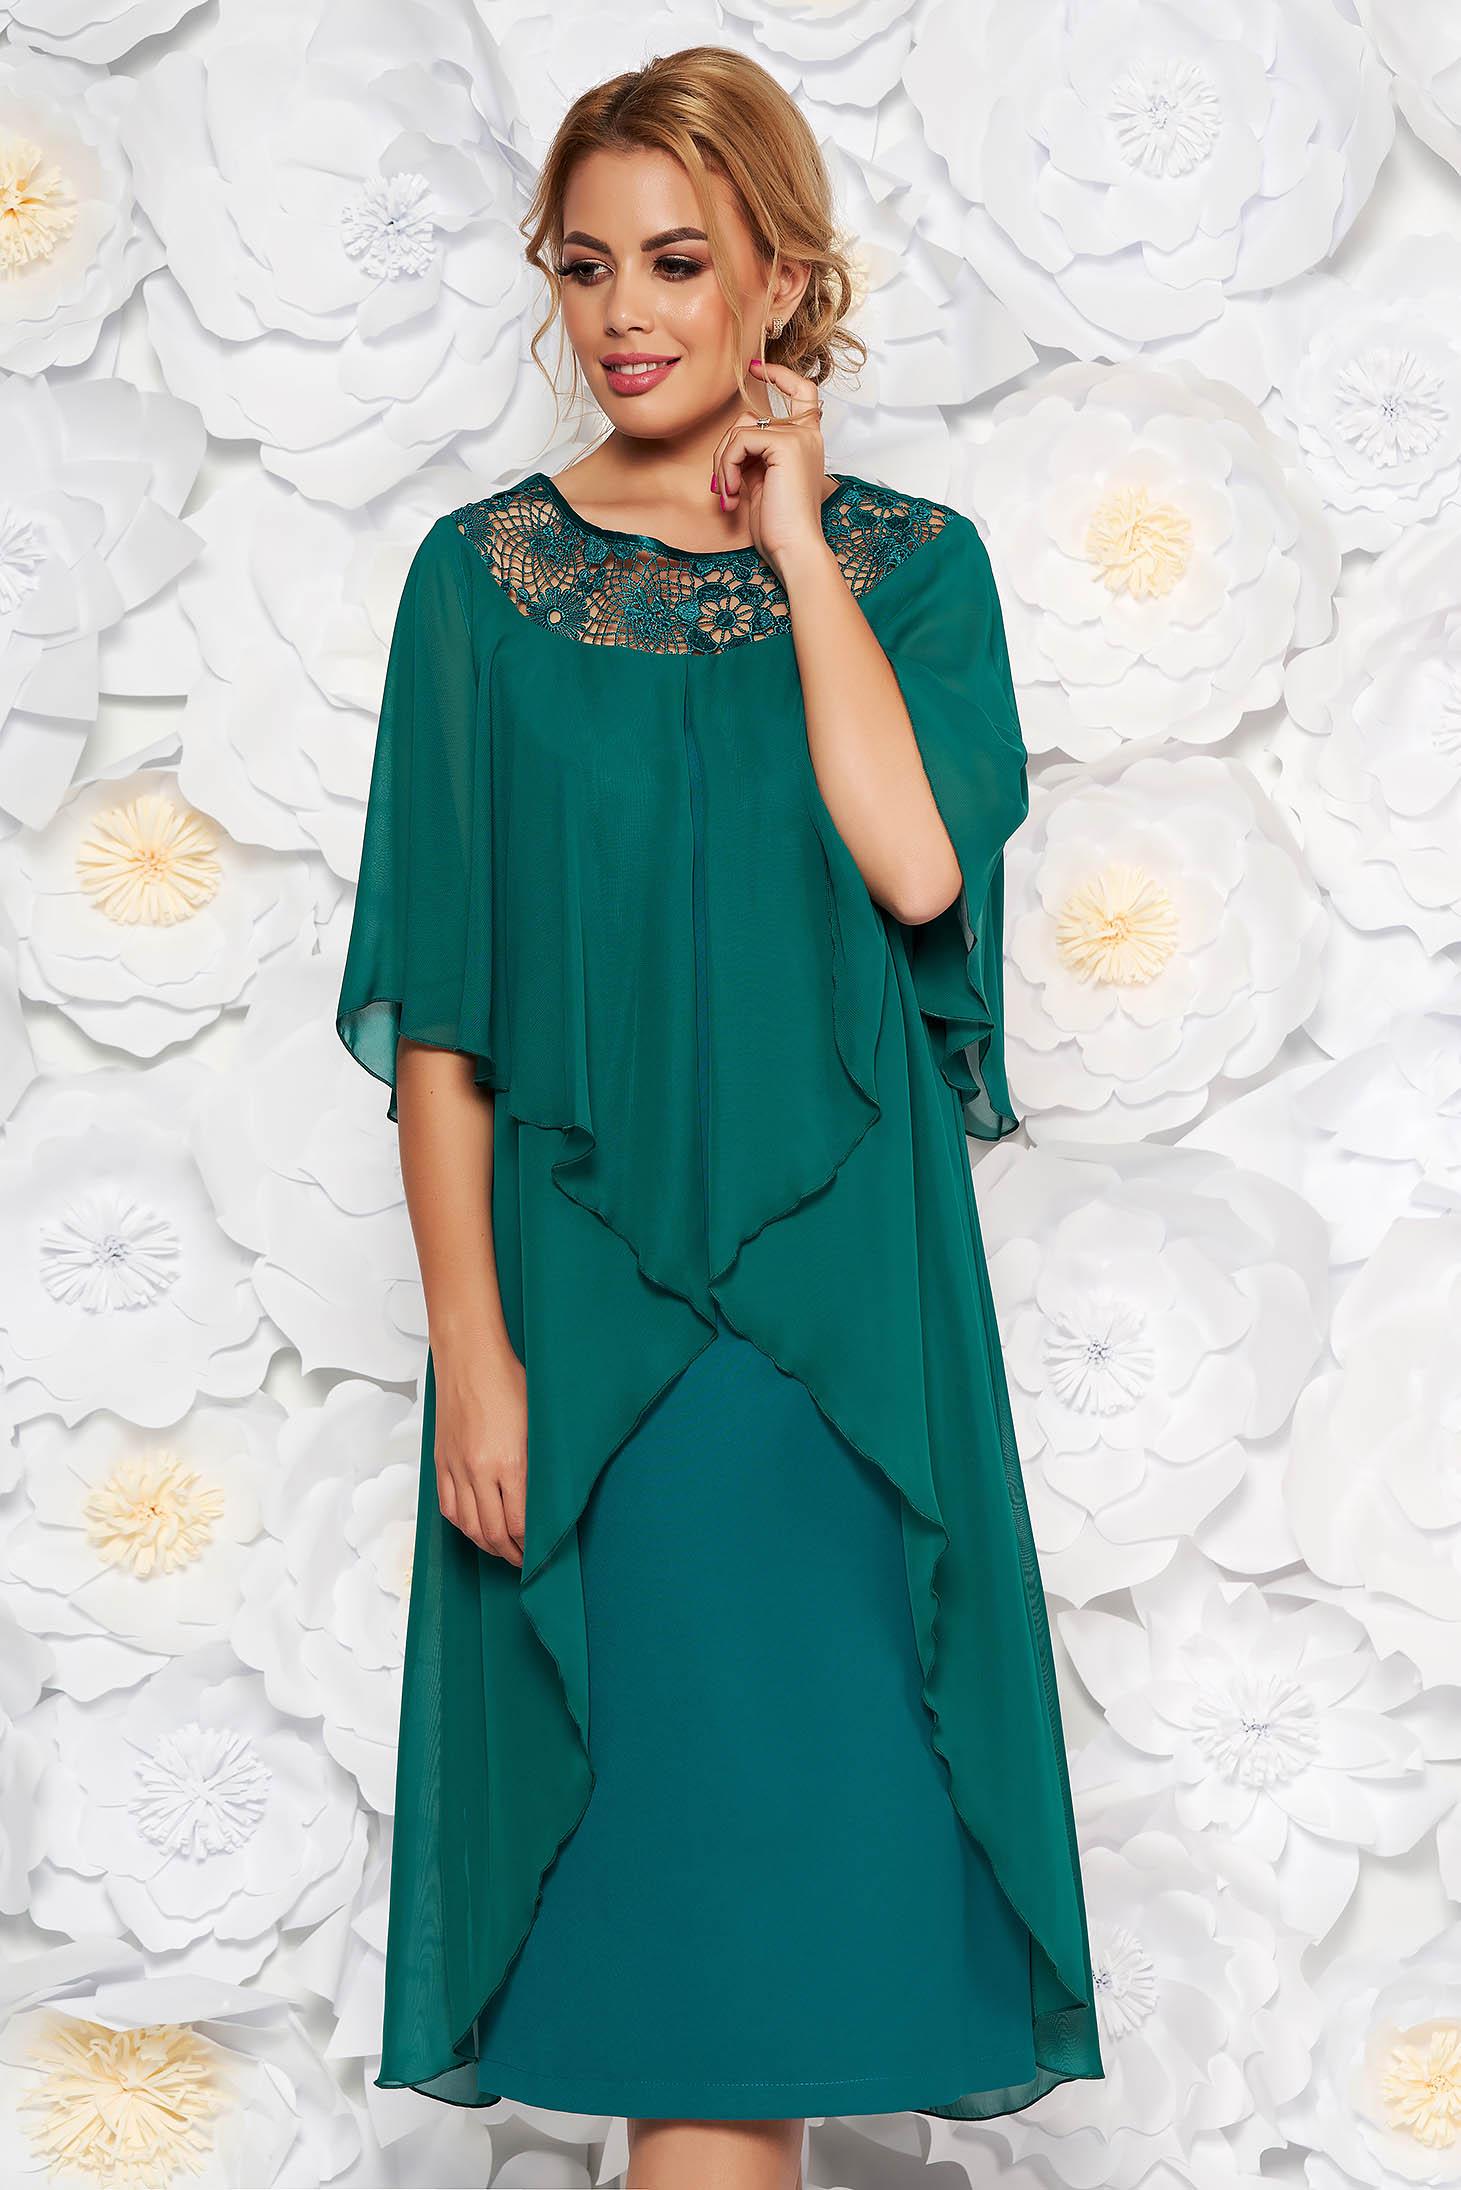 Rochie verde de ocazie cu un croi drept din stofa usor elastica si suprapunere cu voal